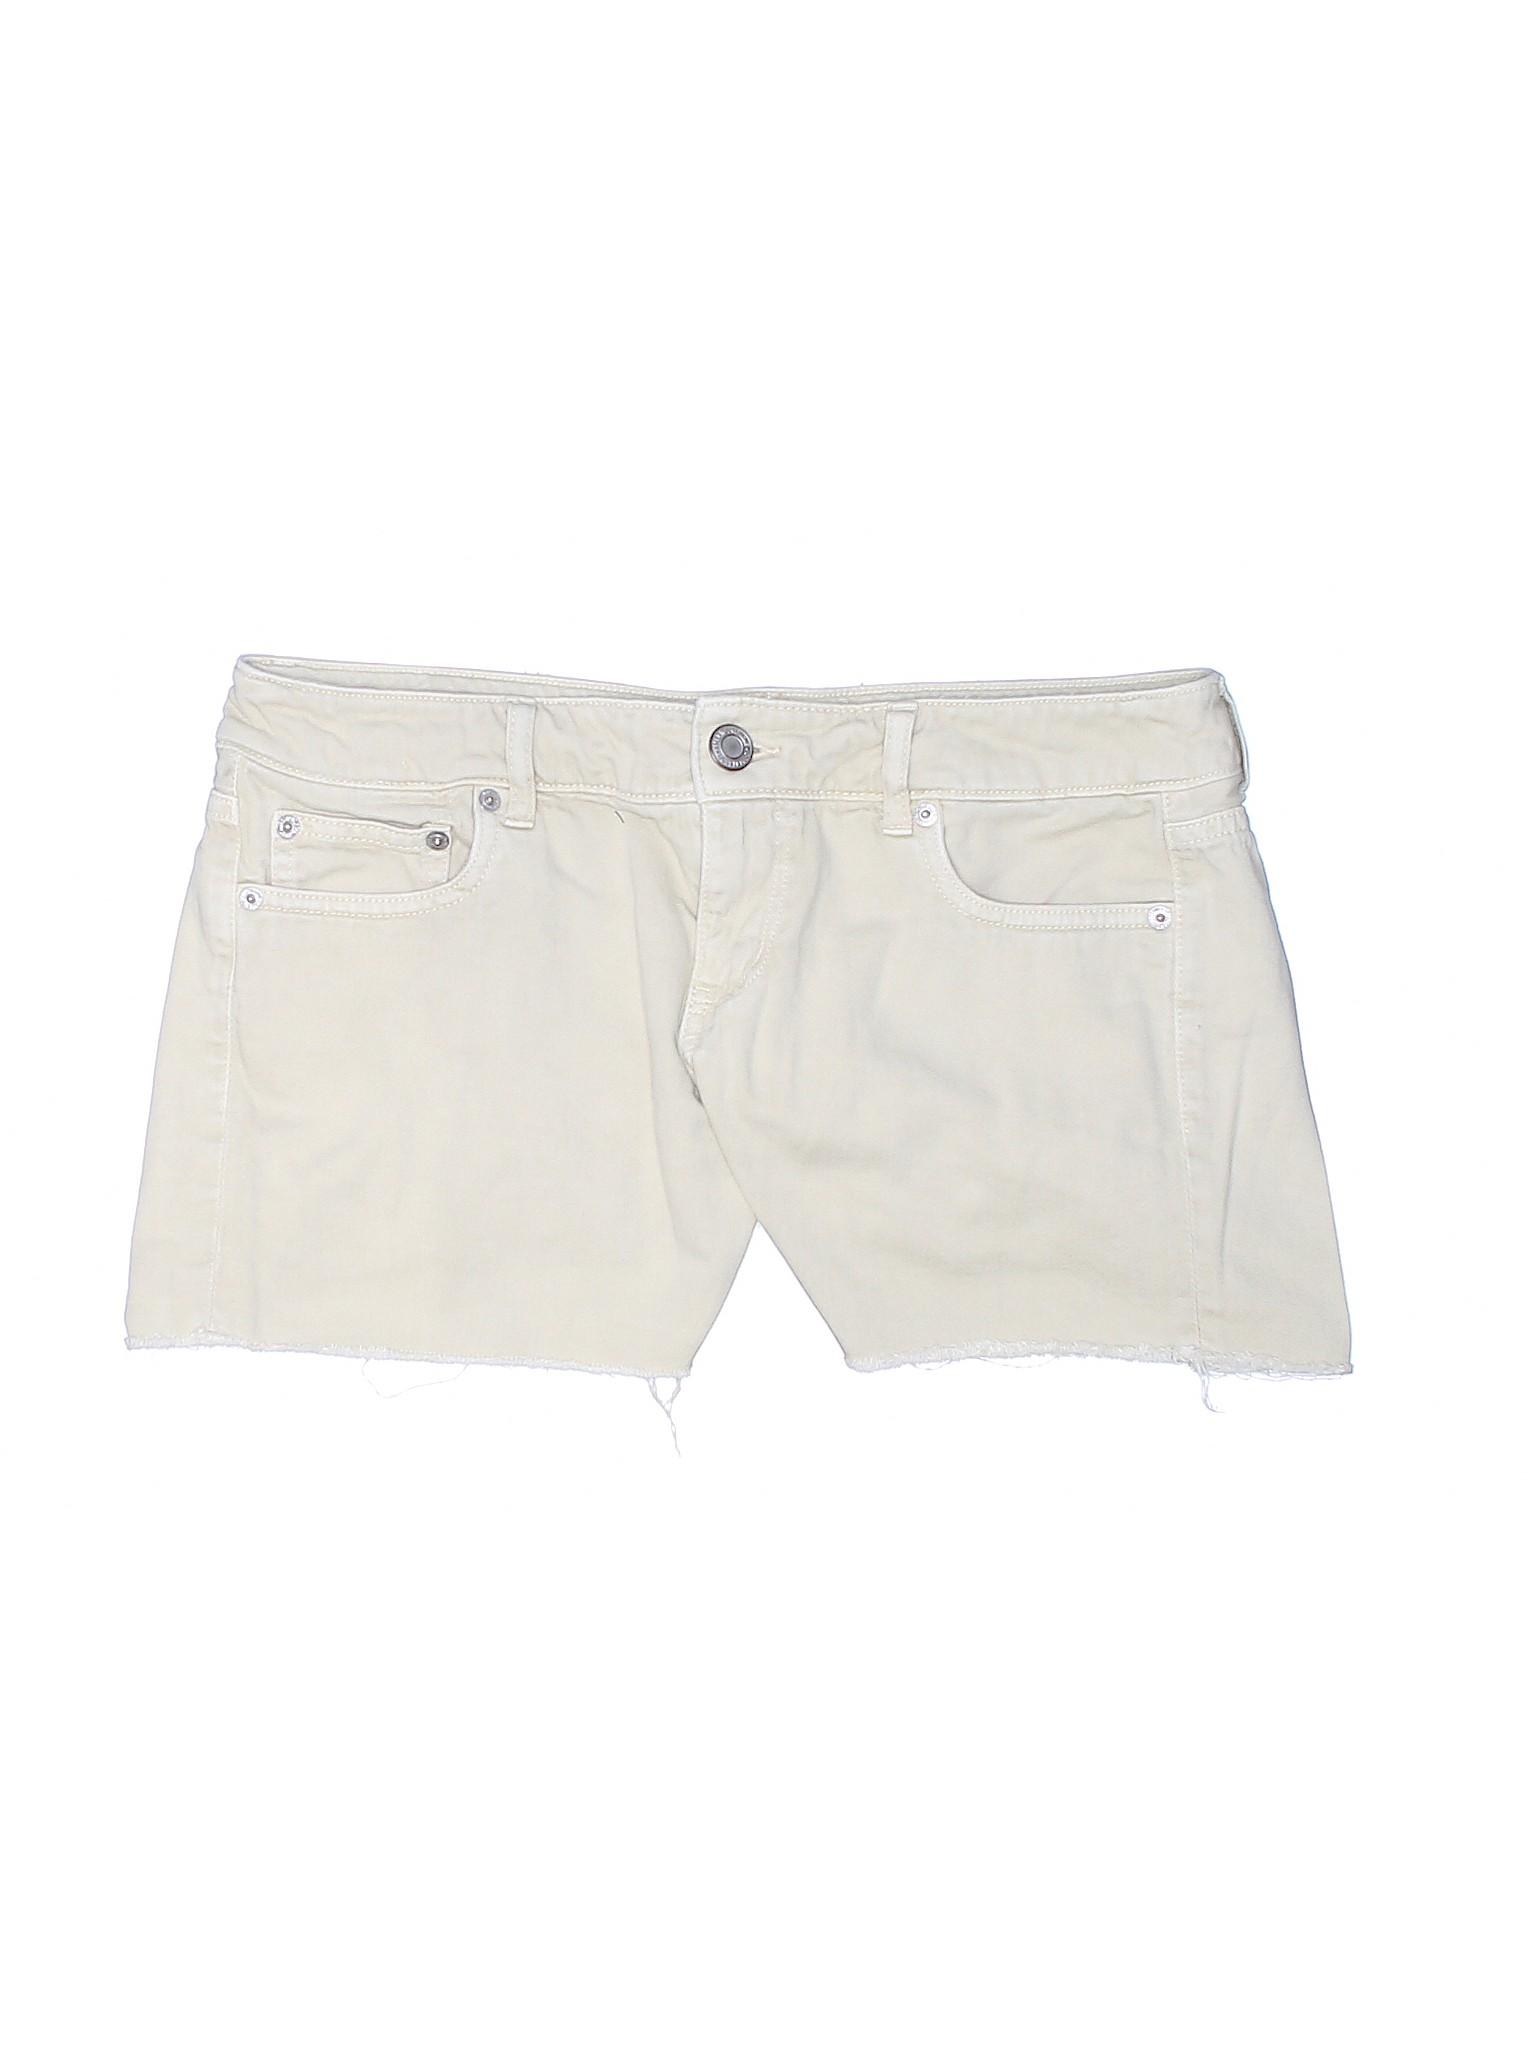 Shorts Denim American Boutique Eagle Outfitters qTwFgIF